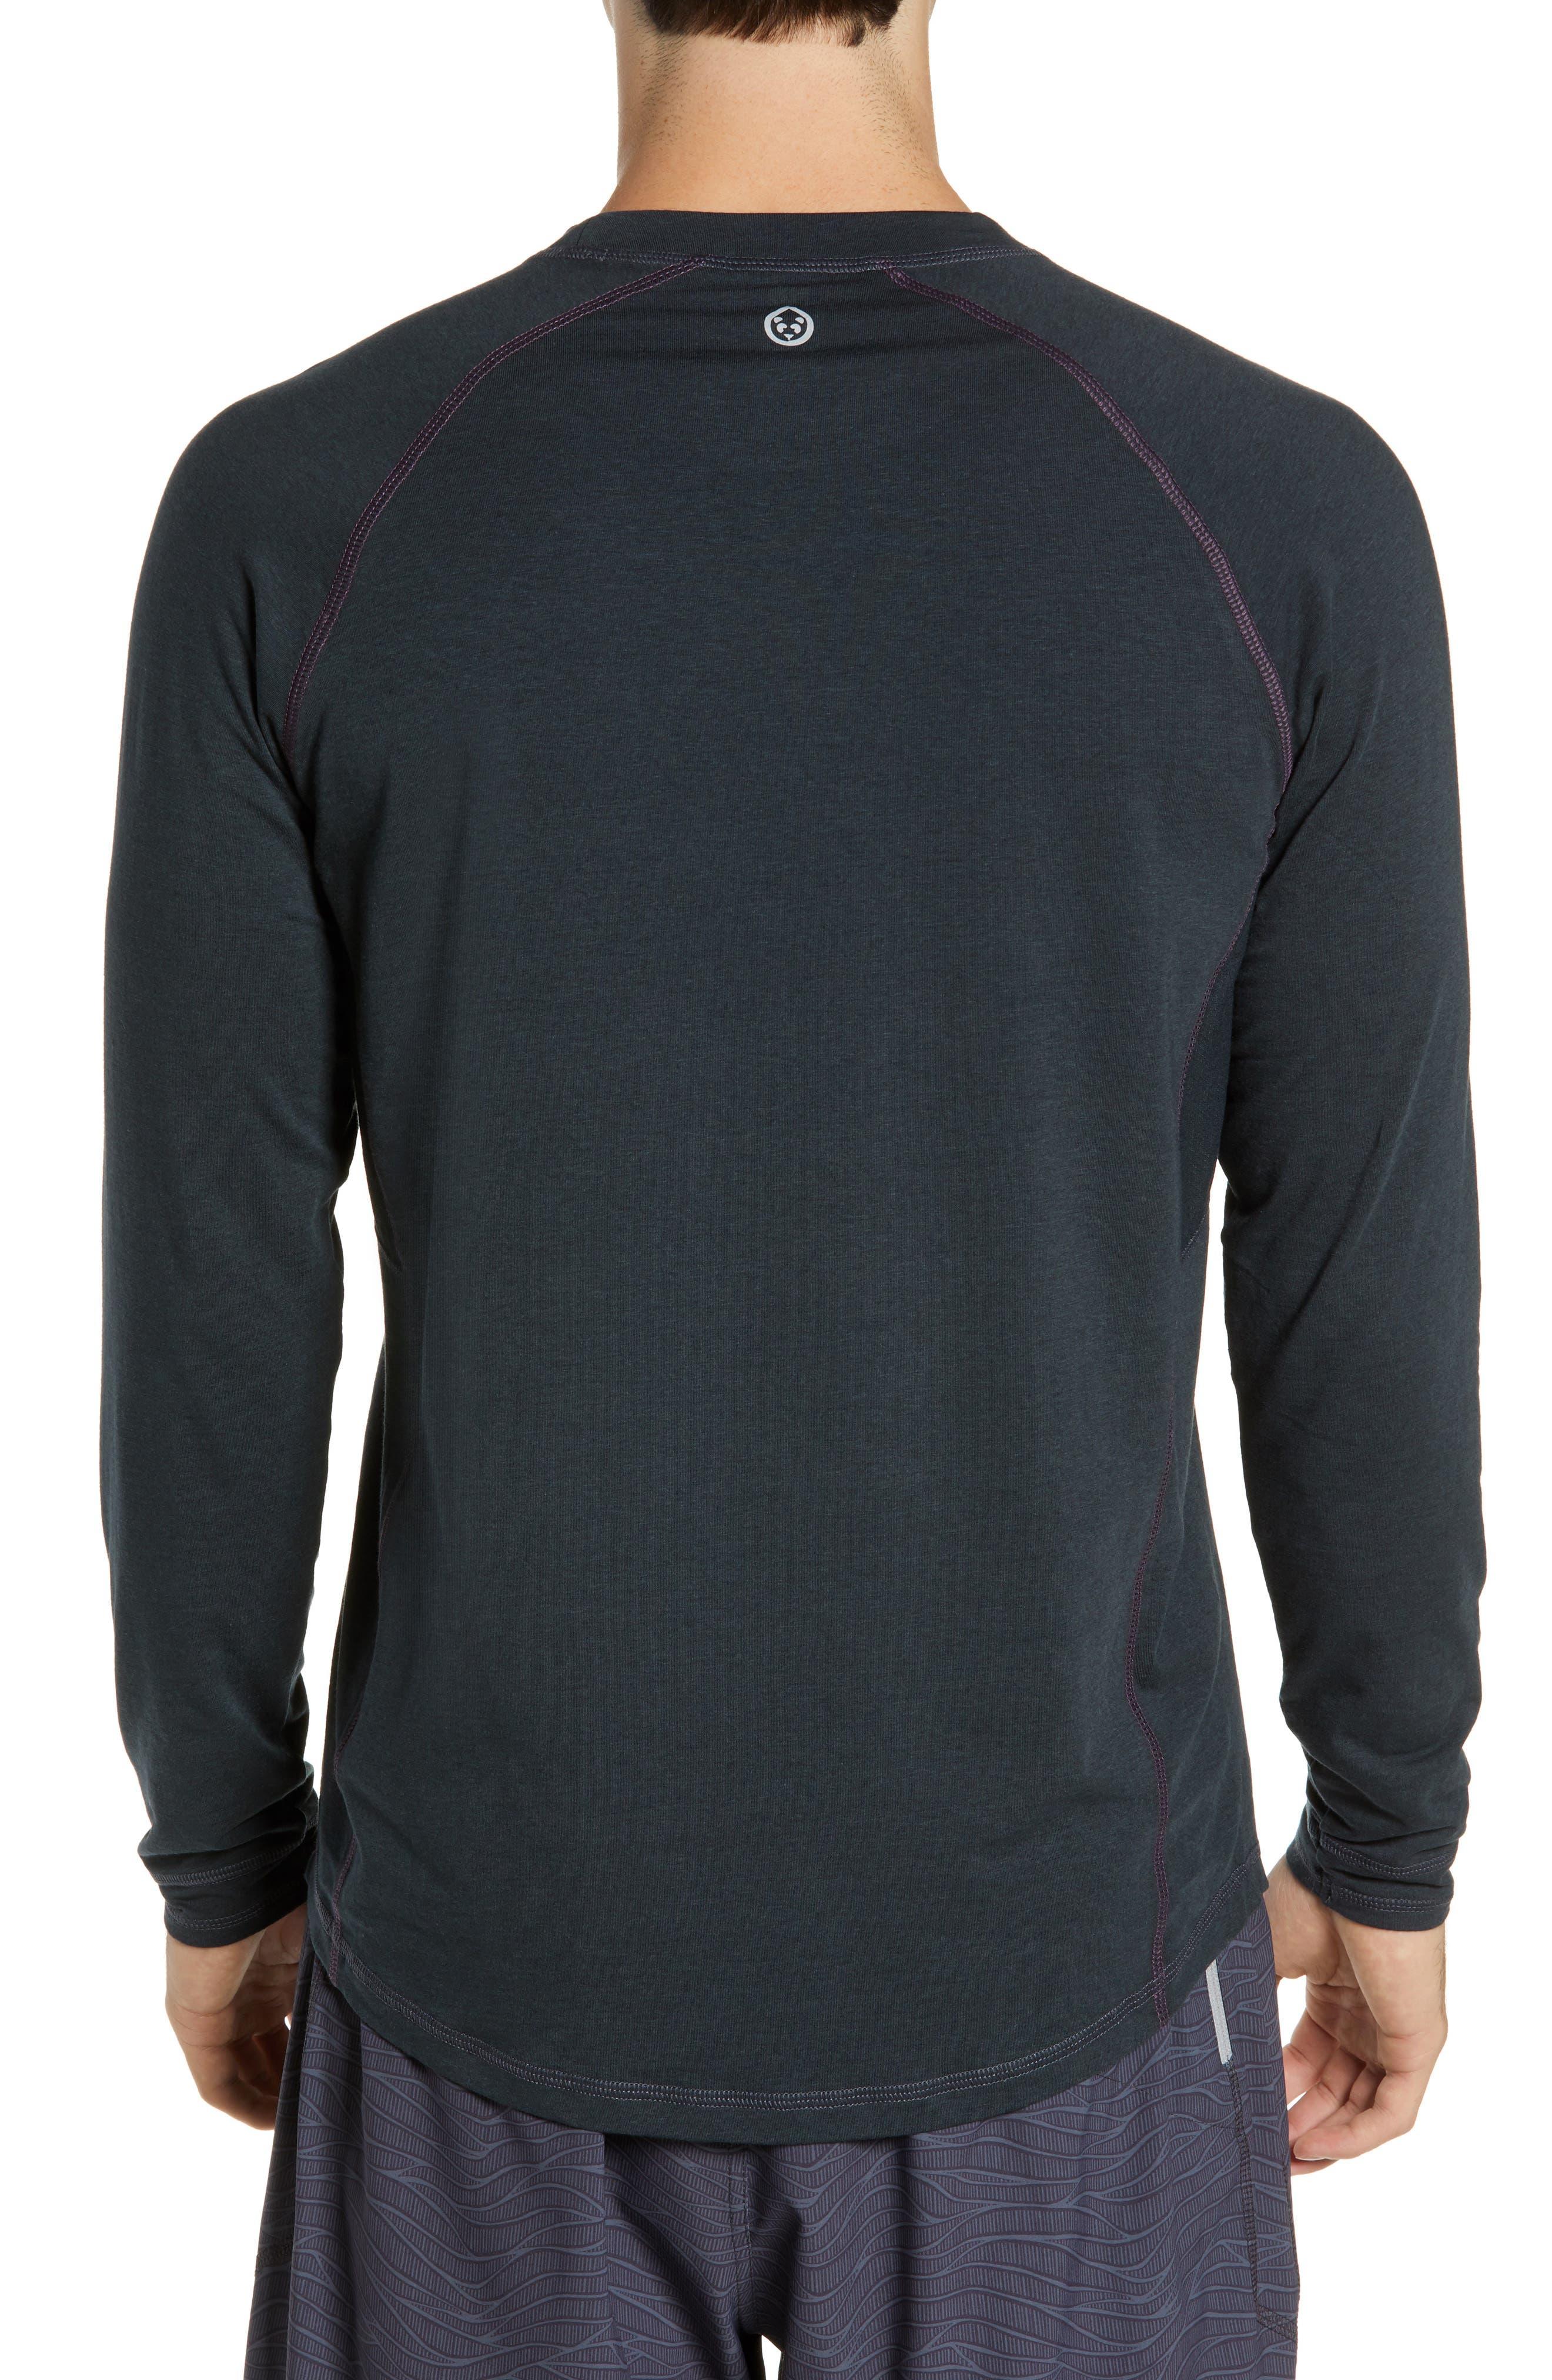 Charge II Long Sleeve T-Shirt,                             Alternate thumbnail 2, color,                             GUNMETAL/ ECLIPSE